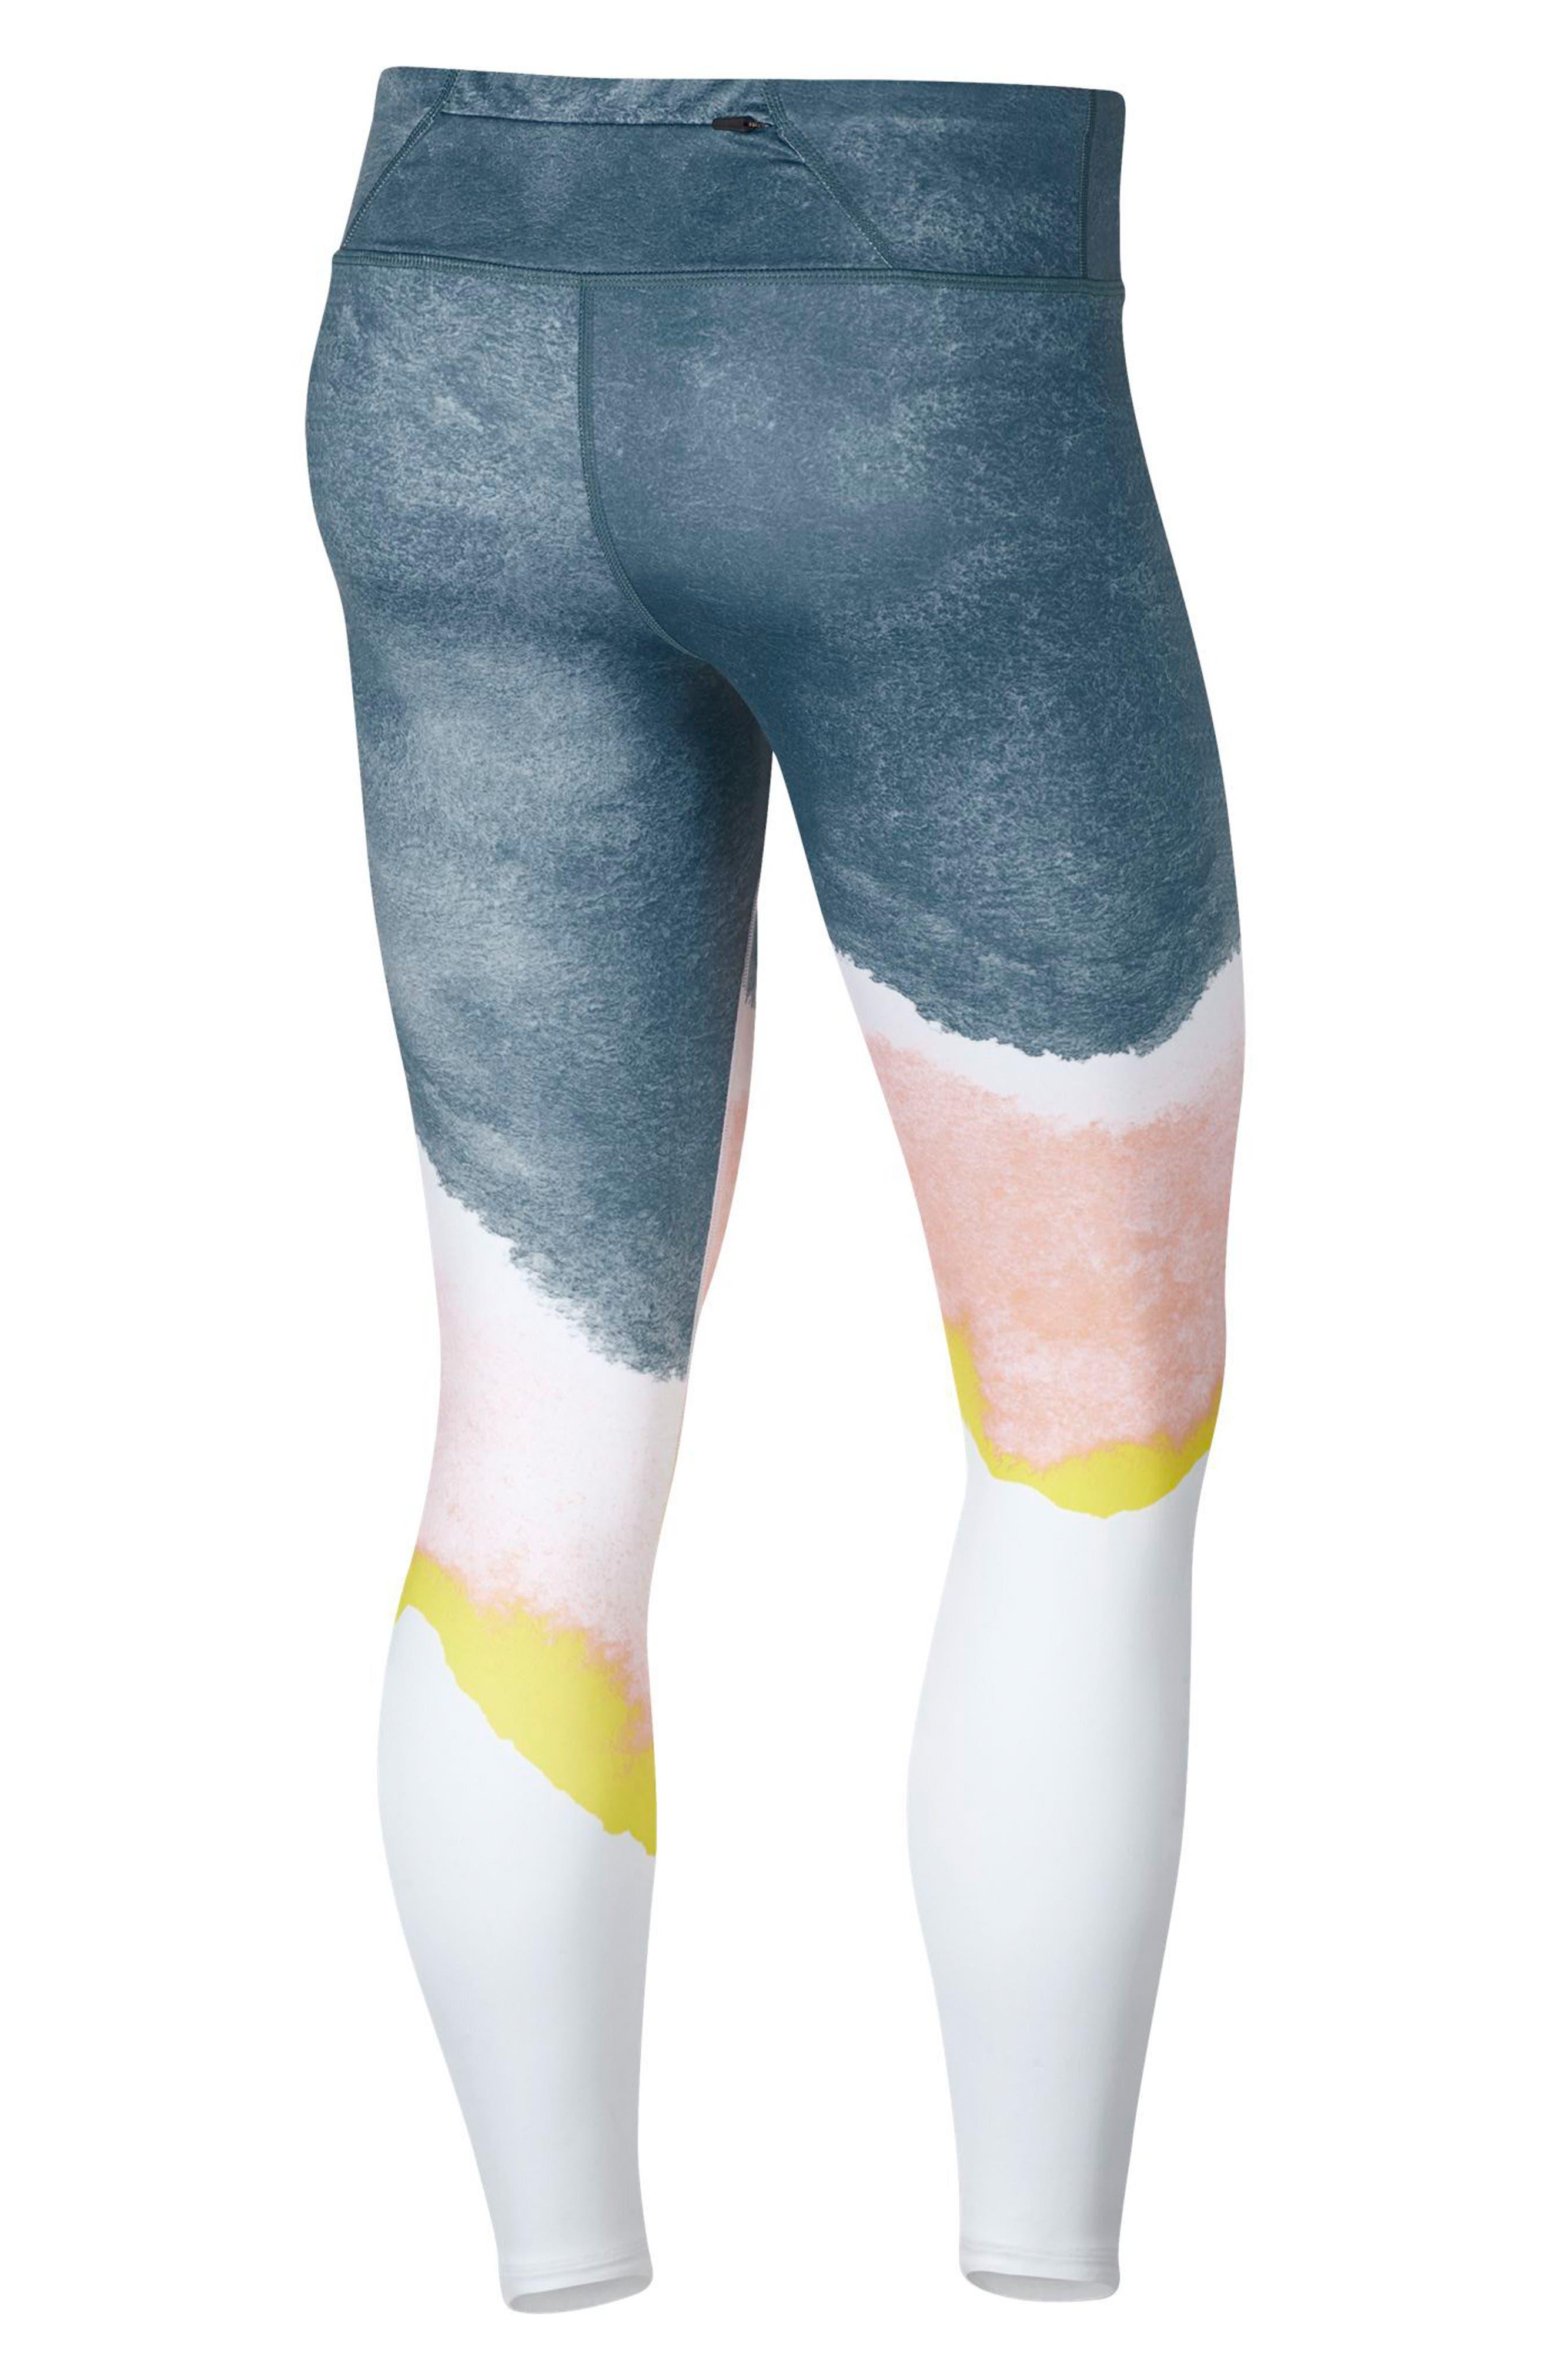 Epic Lux Running Leggings,                             Alternate thumbnail 8, color,                             WHITE/ STORM PINK/ GOLD